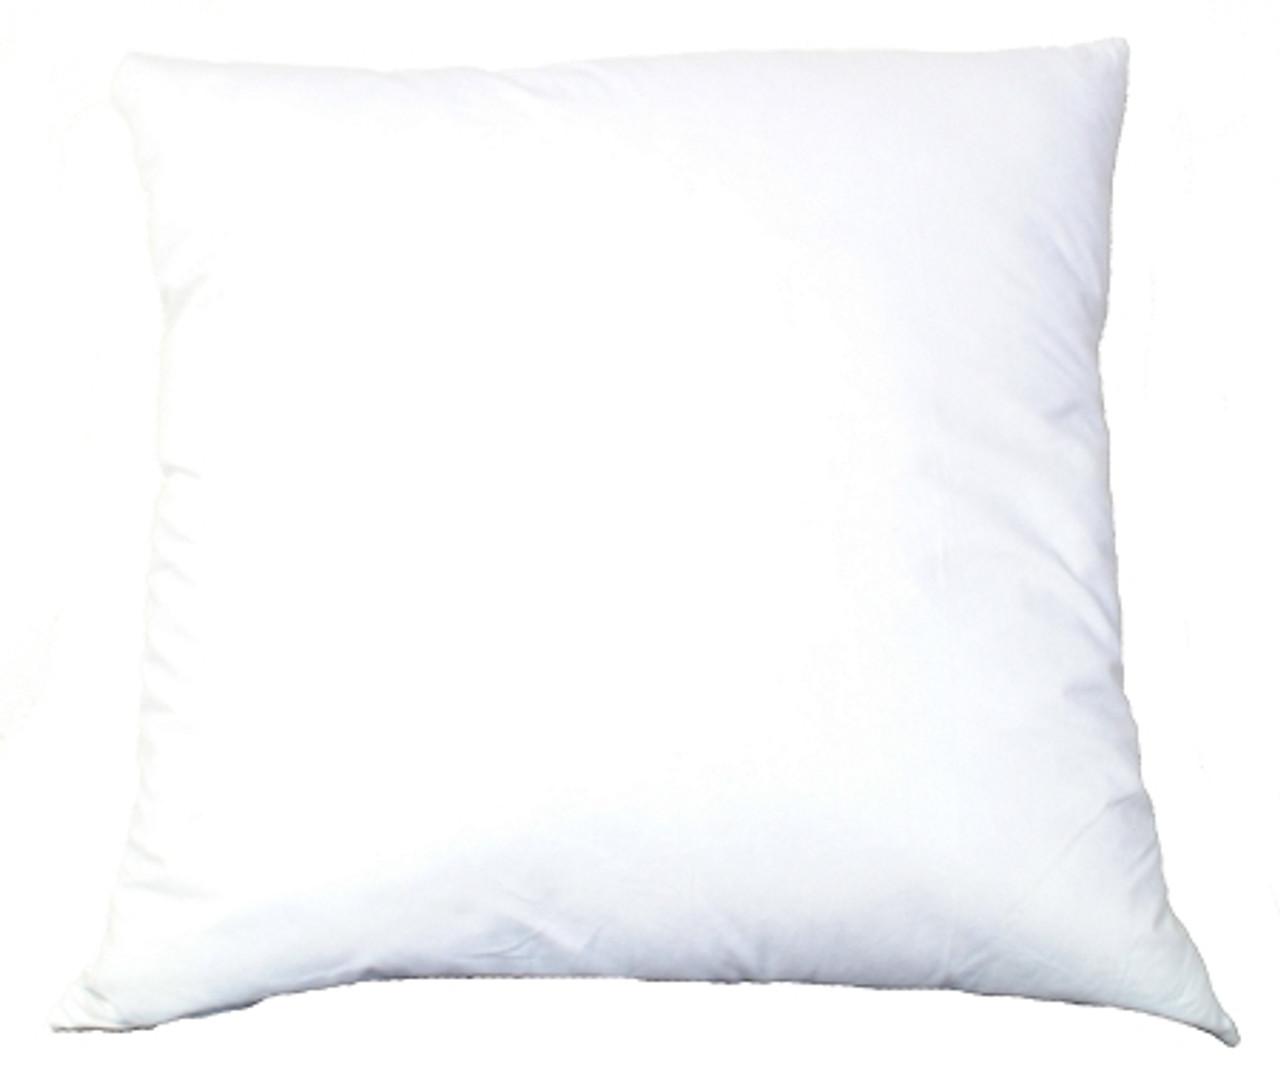 Booth Bay Sailboat Hooked Pillow